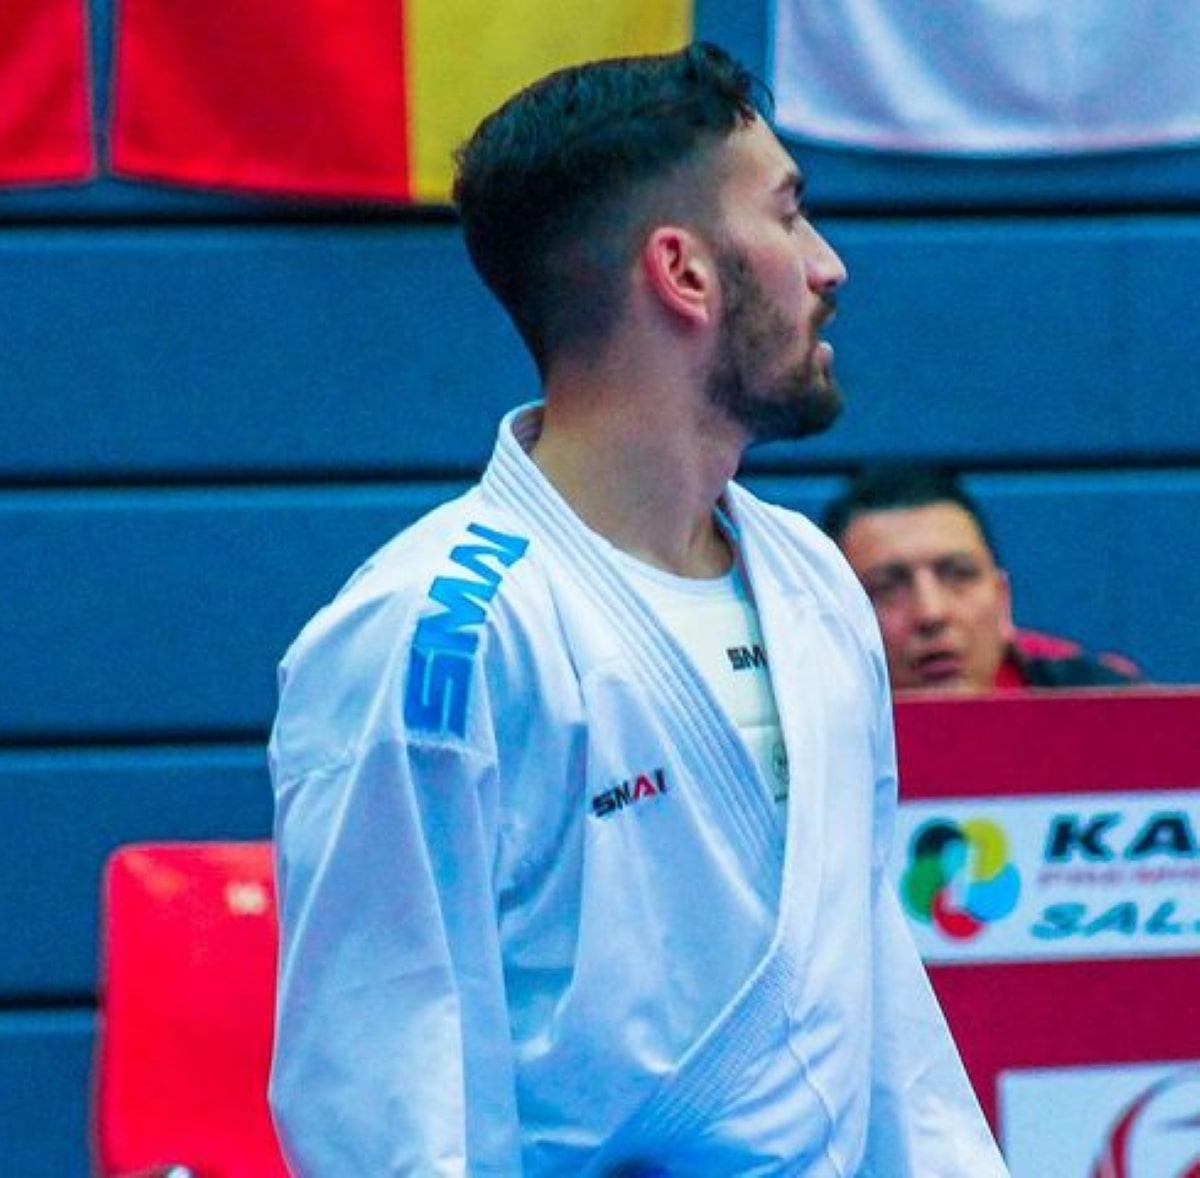 Angelo Crescenzo Karate Olimpiadi Tokyo Cervello Spento 30 Minuti Colpo